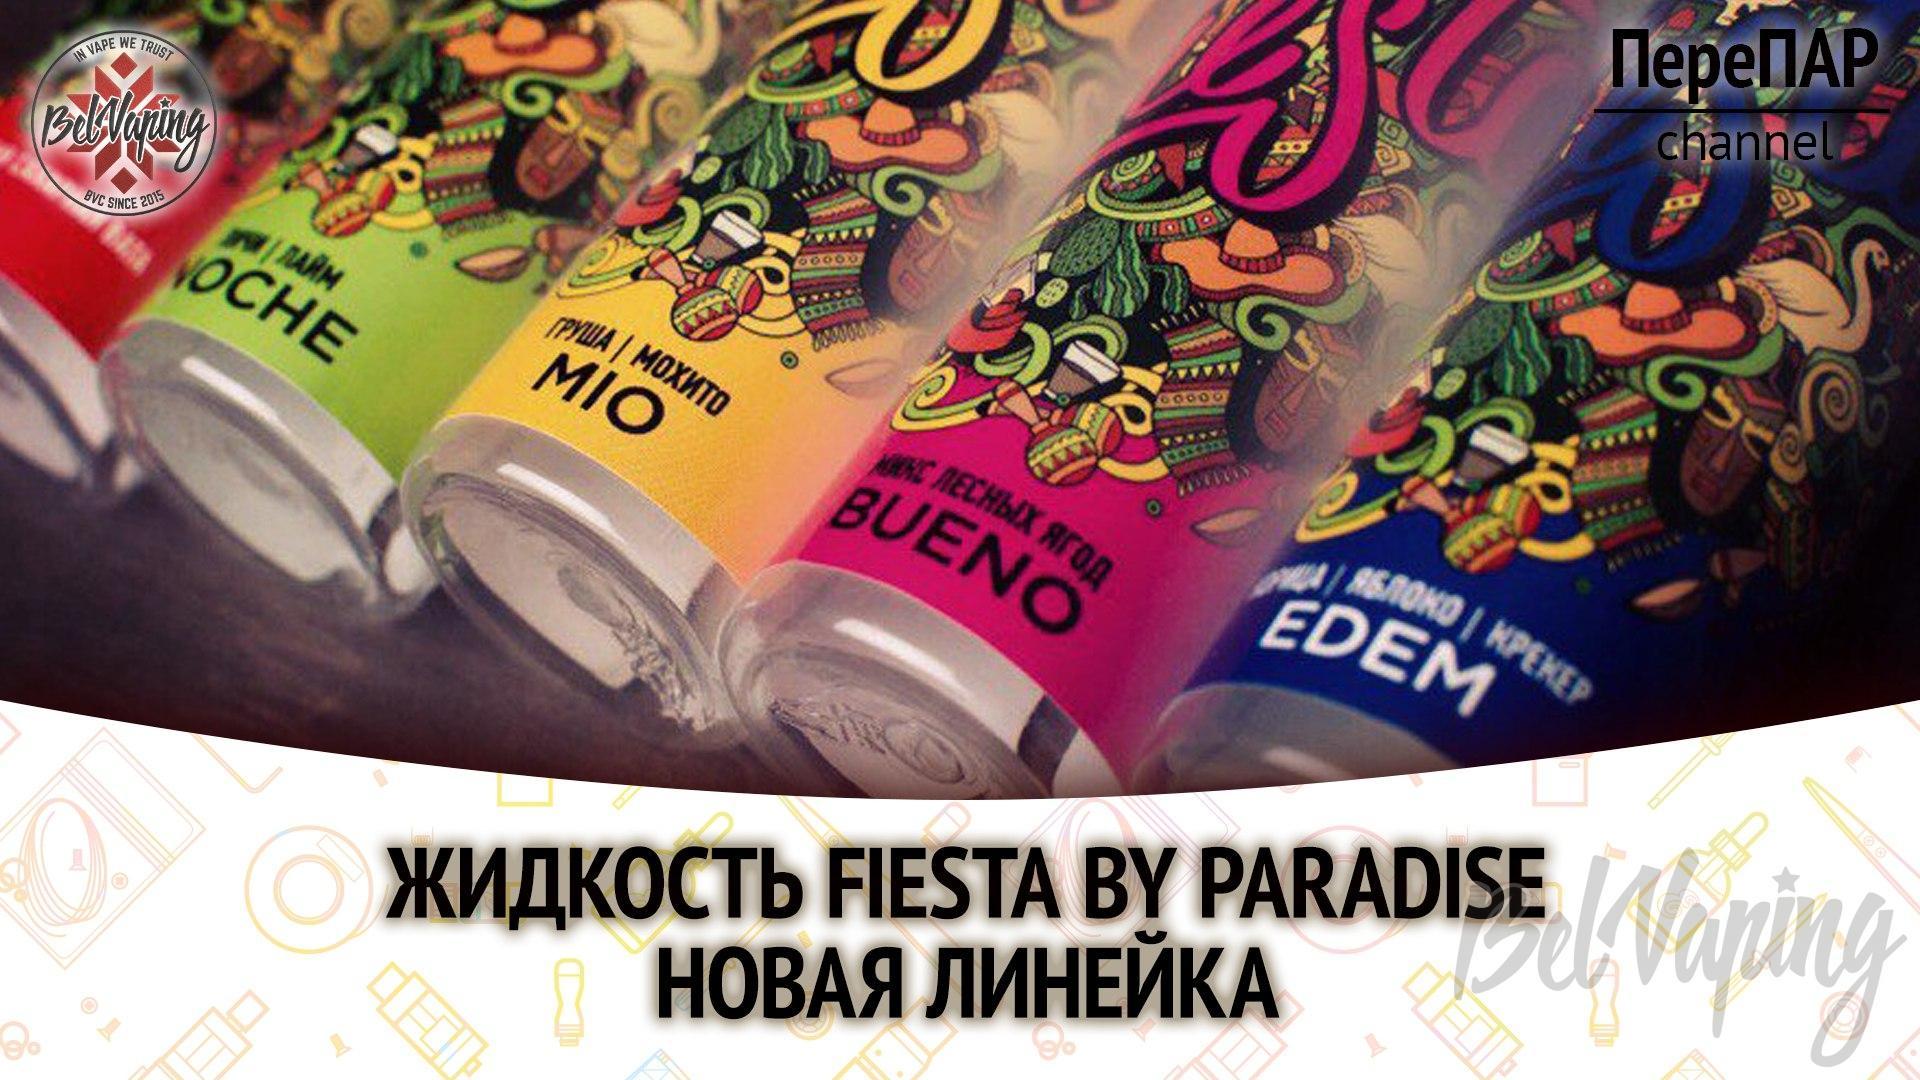 Жидкости Fiesta от Paradise Family